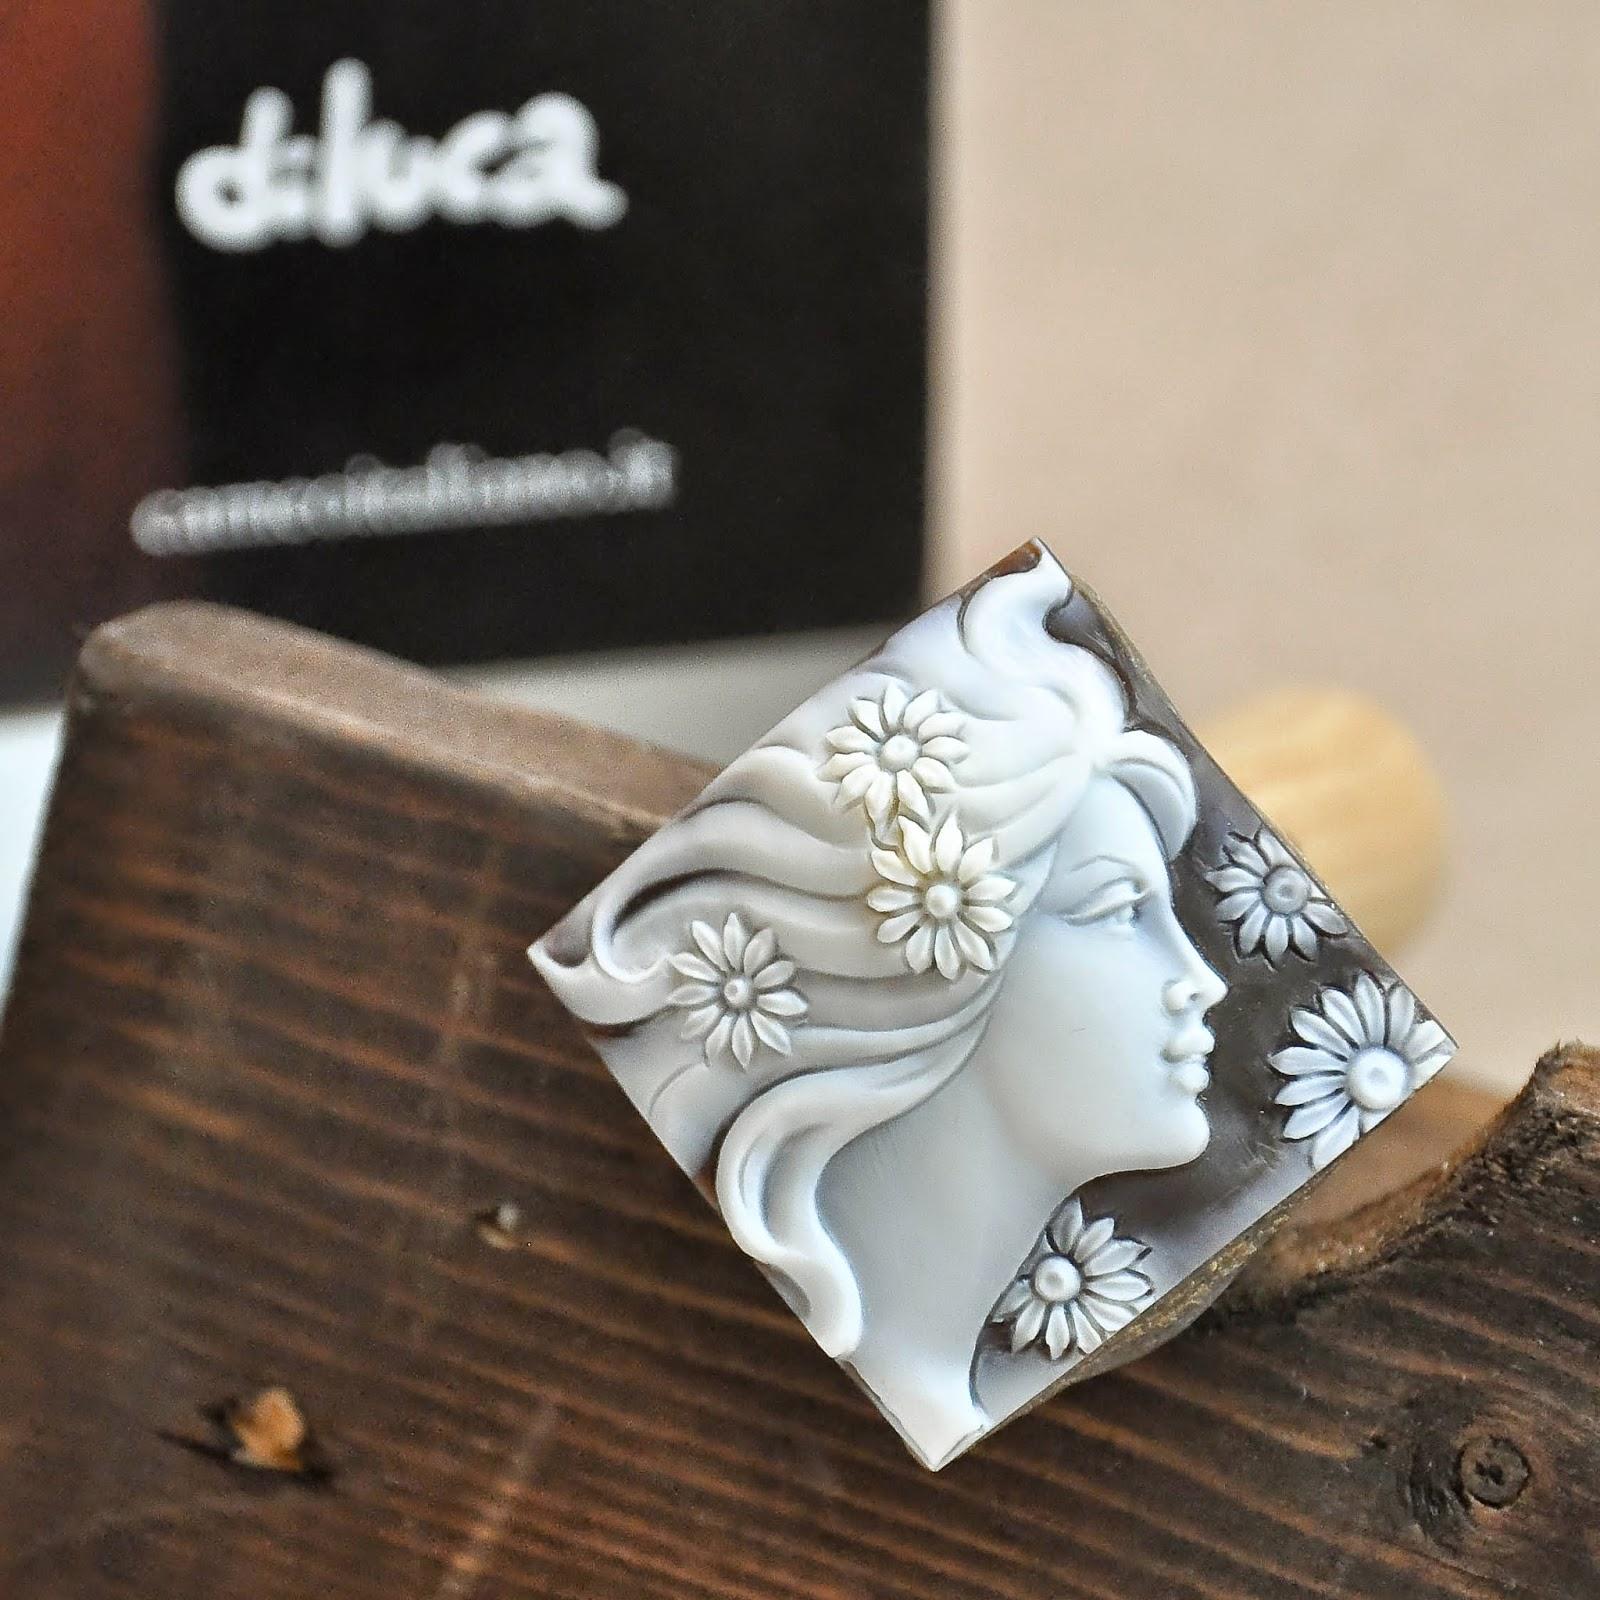 An Italian hand-carved cameo